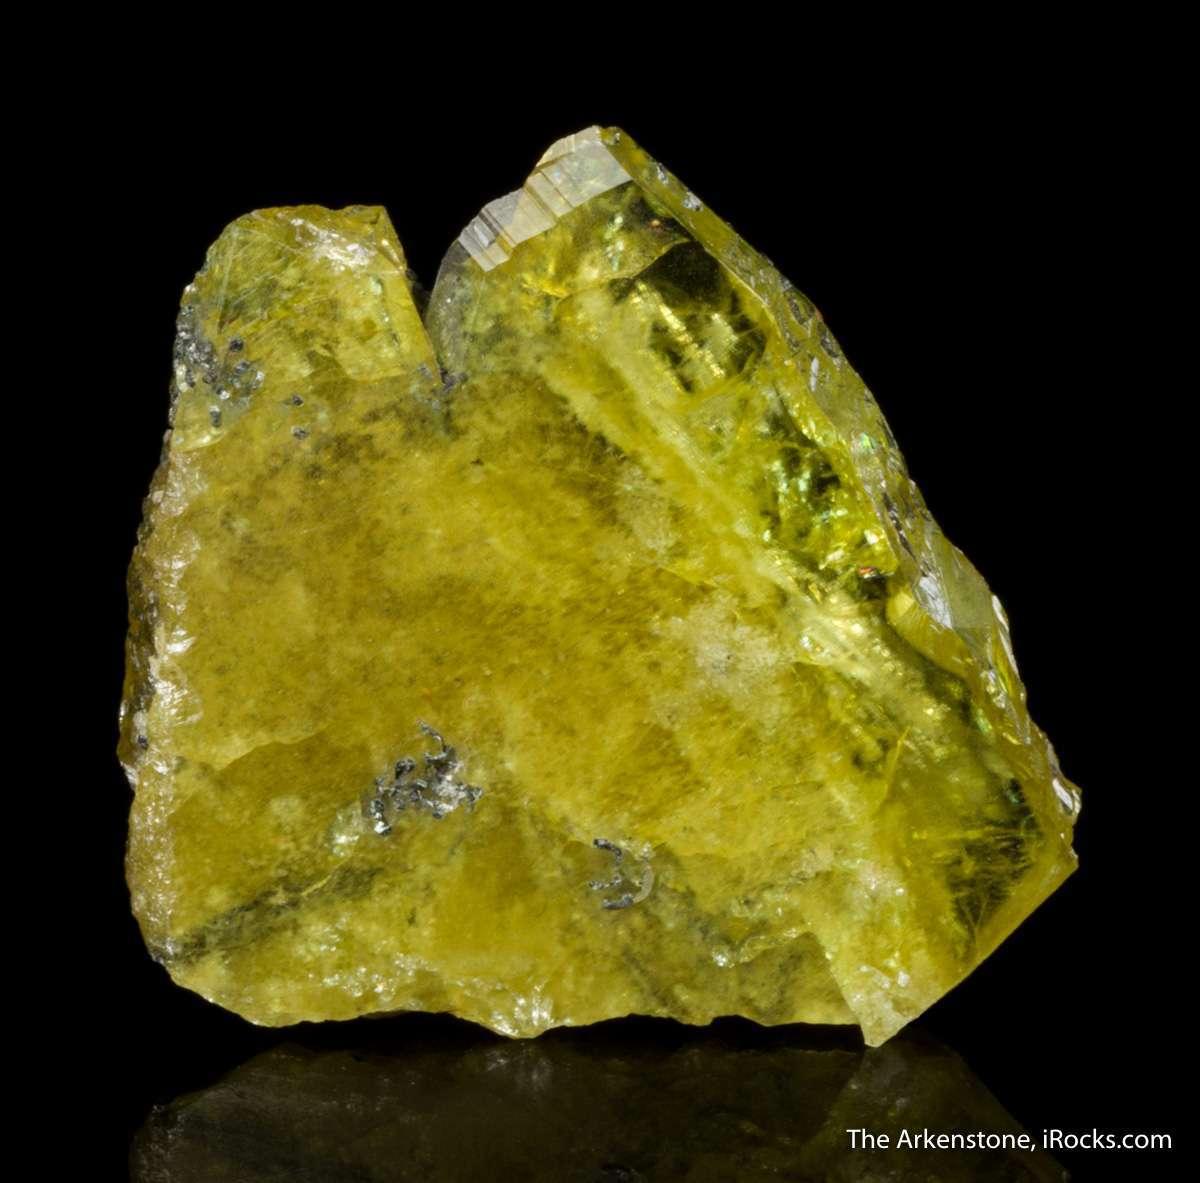 This flattened twinned oldtime titanite crystal lustrous translucent